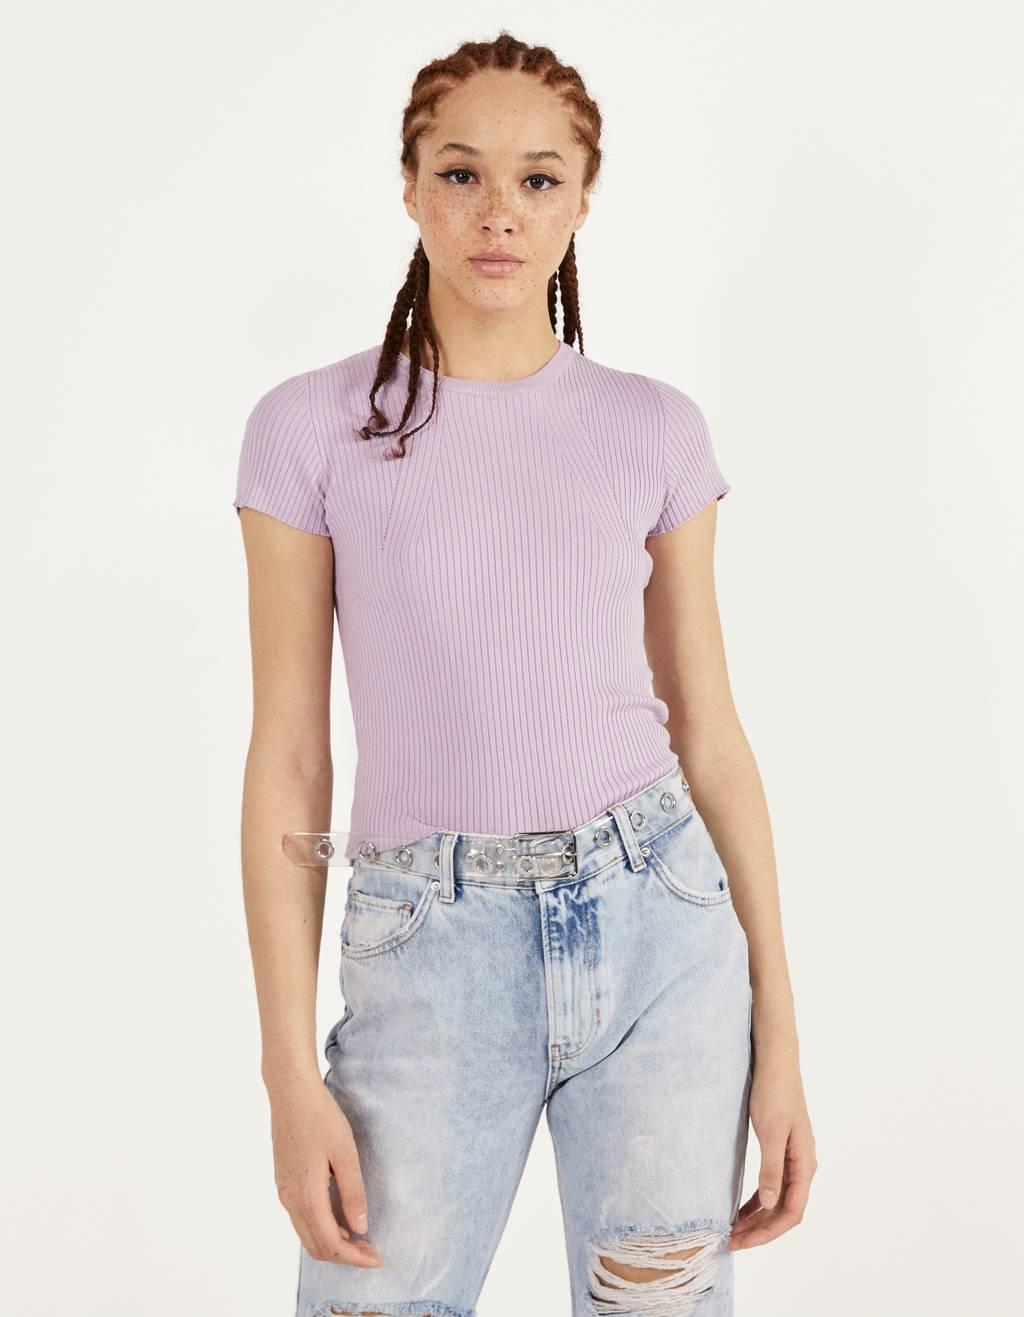 Camiseta de manga corta y canalé